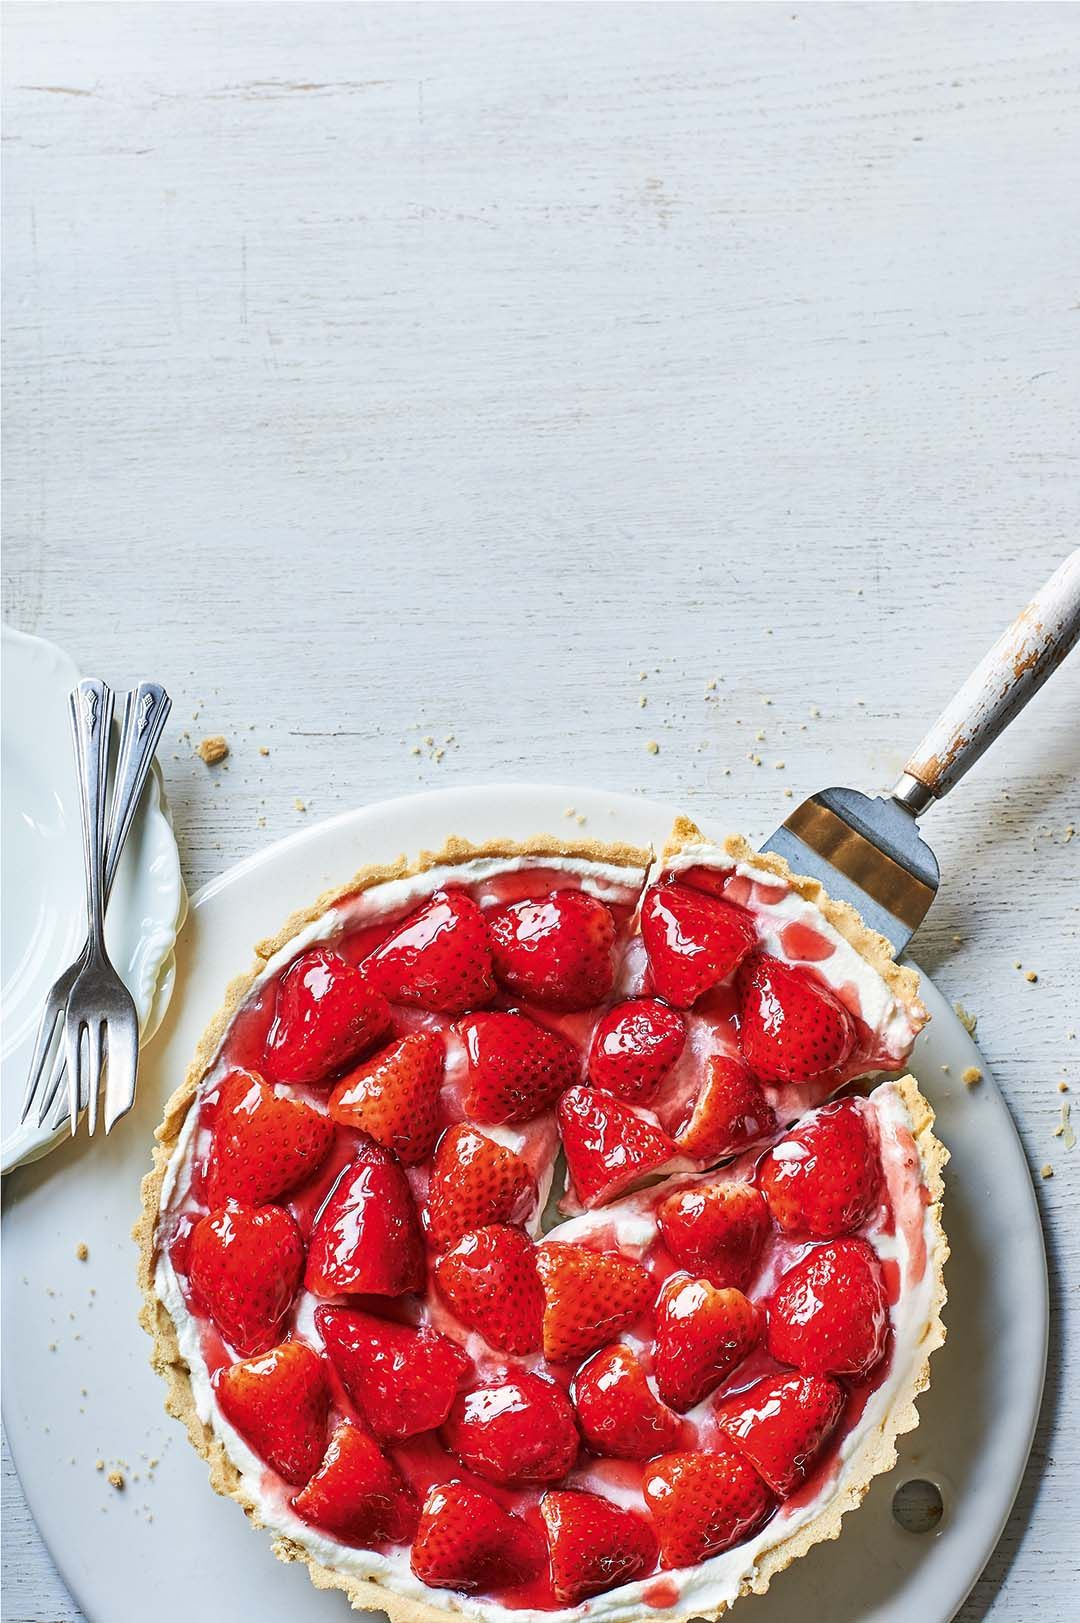 British strawberries. They taste pretty good on their own